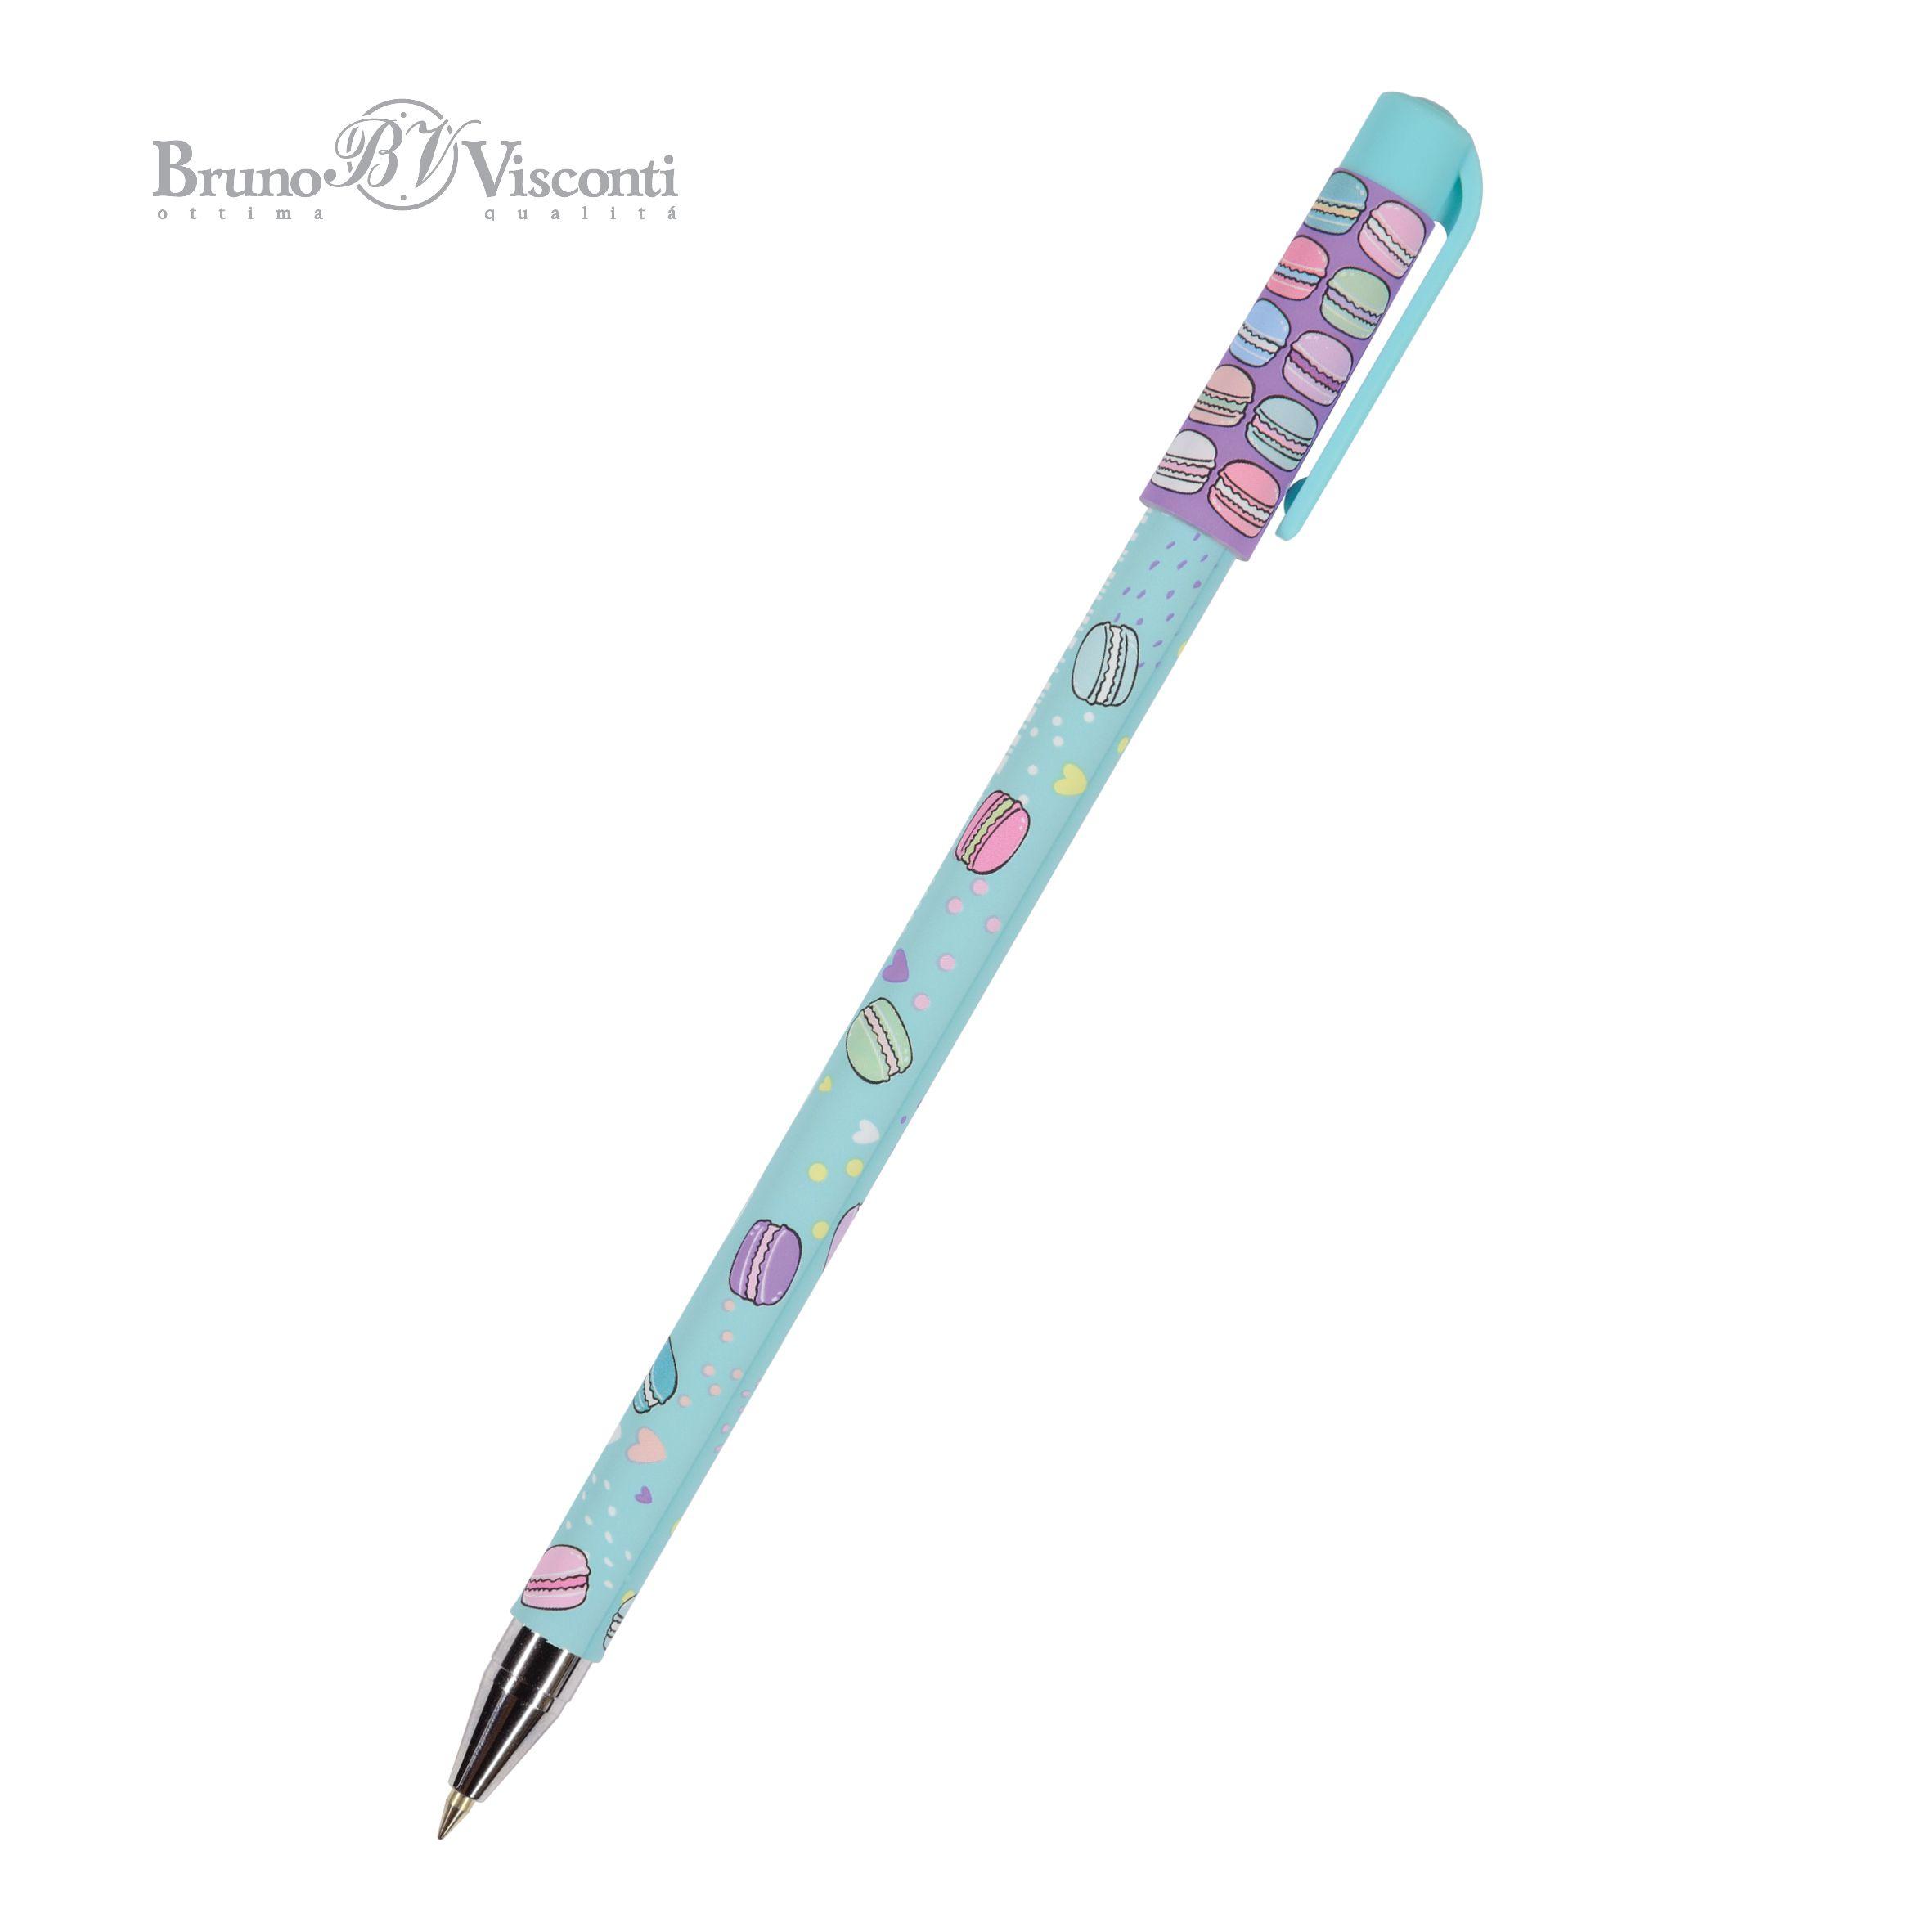 Ручка шариковая синяя BV HappyWrite. My sweet. Mакаруны 0,5мм принт